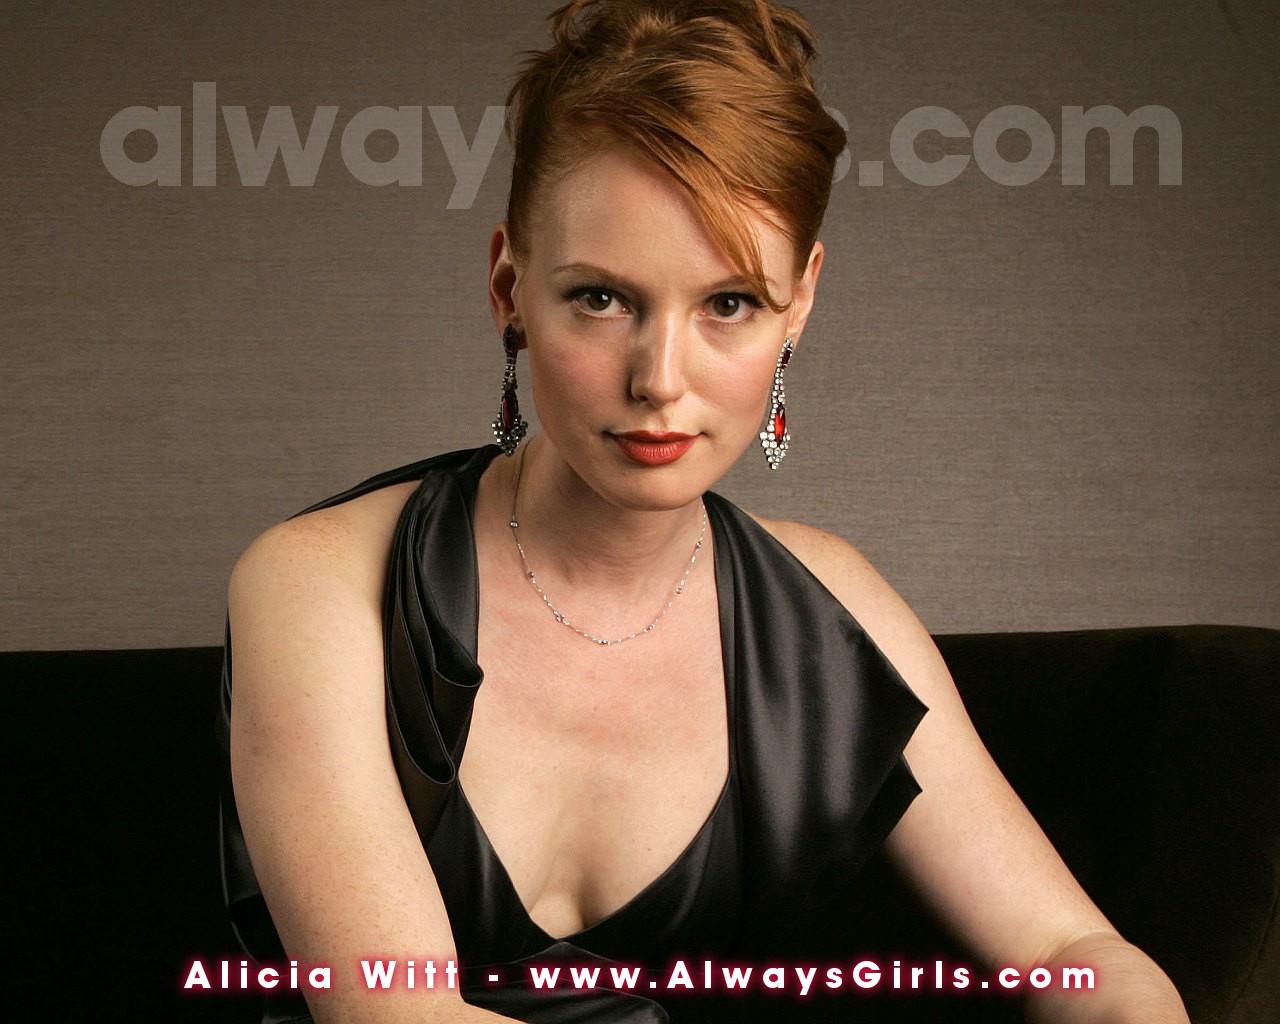 http://3.bp.blogspot.com/-3HrZle-25IM/UTd8HP583mI/AAAAAAAAHhw/OG7ZRJMbs9U/s1600/Alicia+Witt+5.jpg